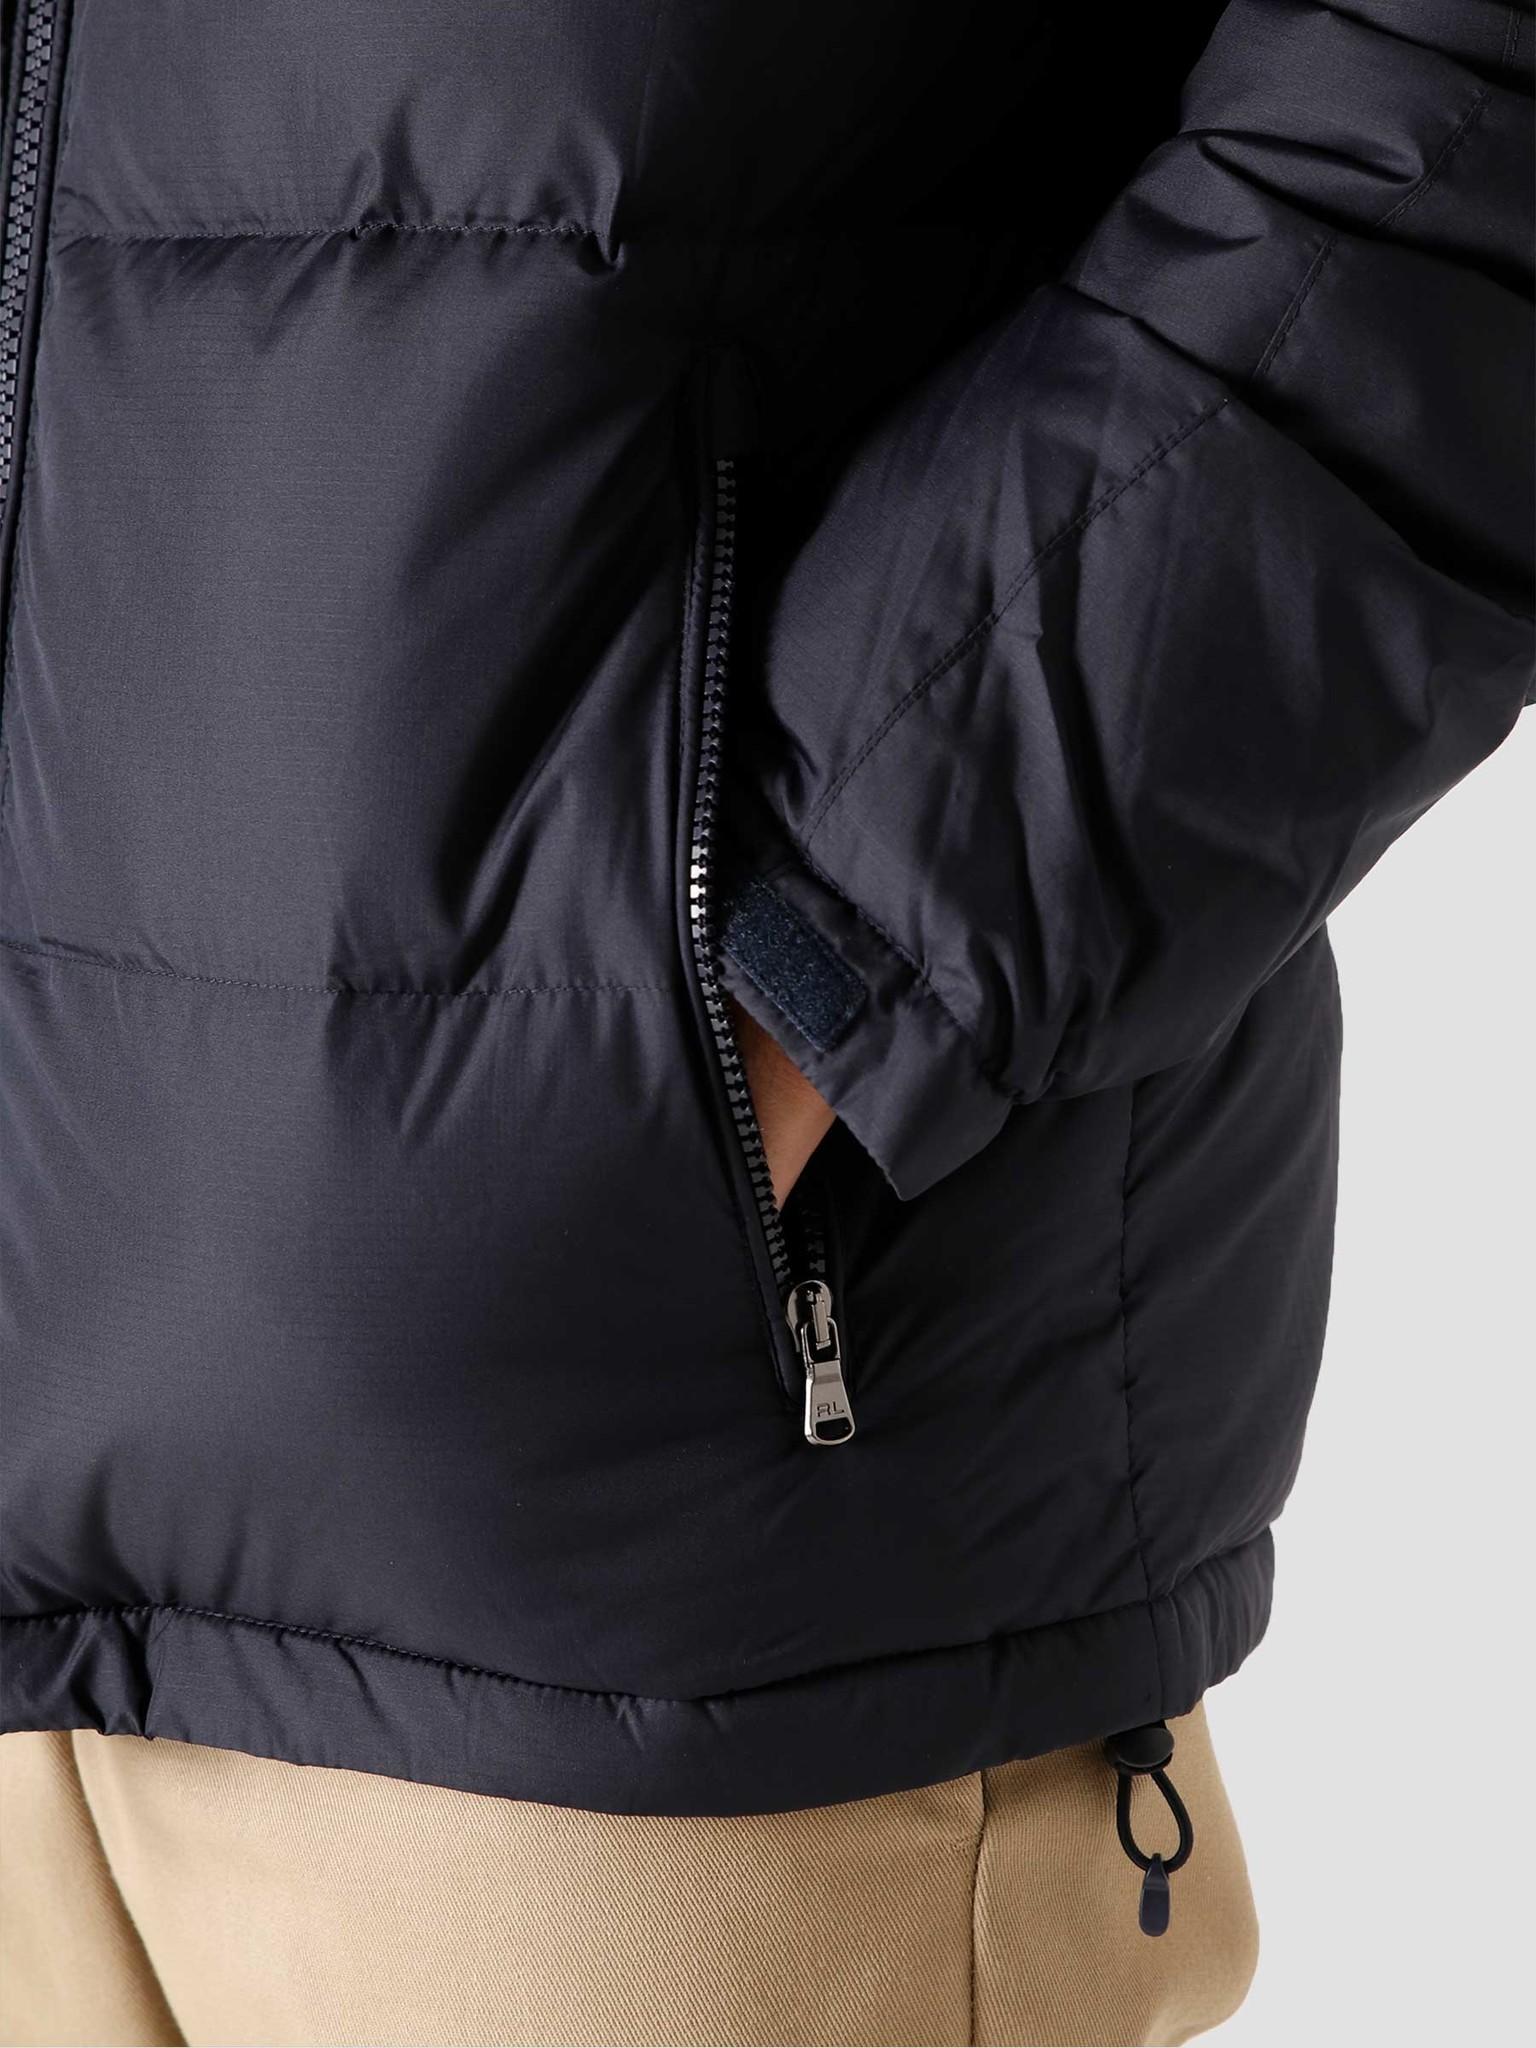 Polo Ralph Lauren Polo Ralph Lauren El Cap Down Fill Jacket Collection Navy 710810936002